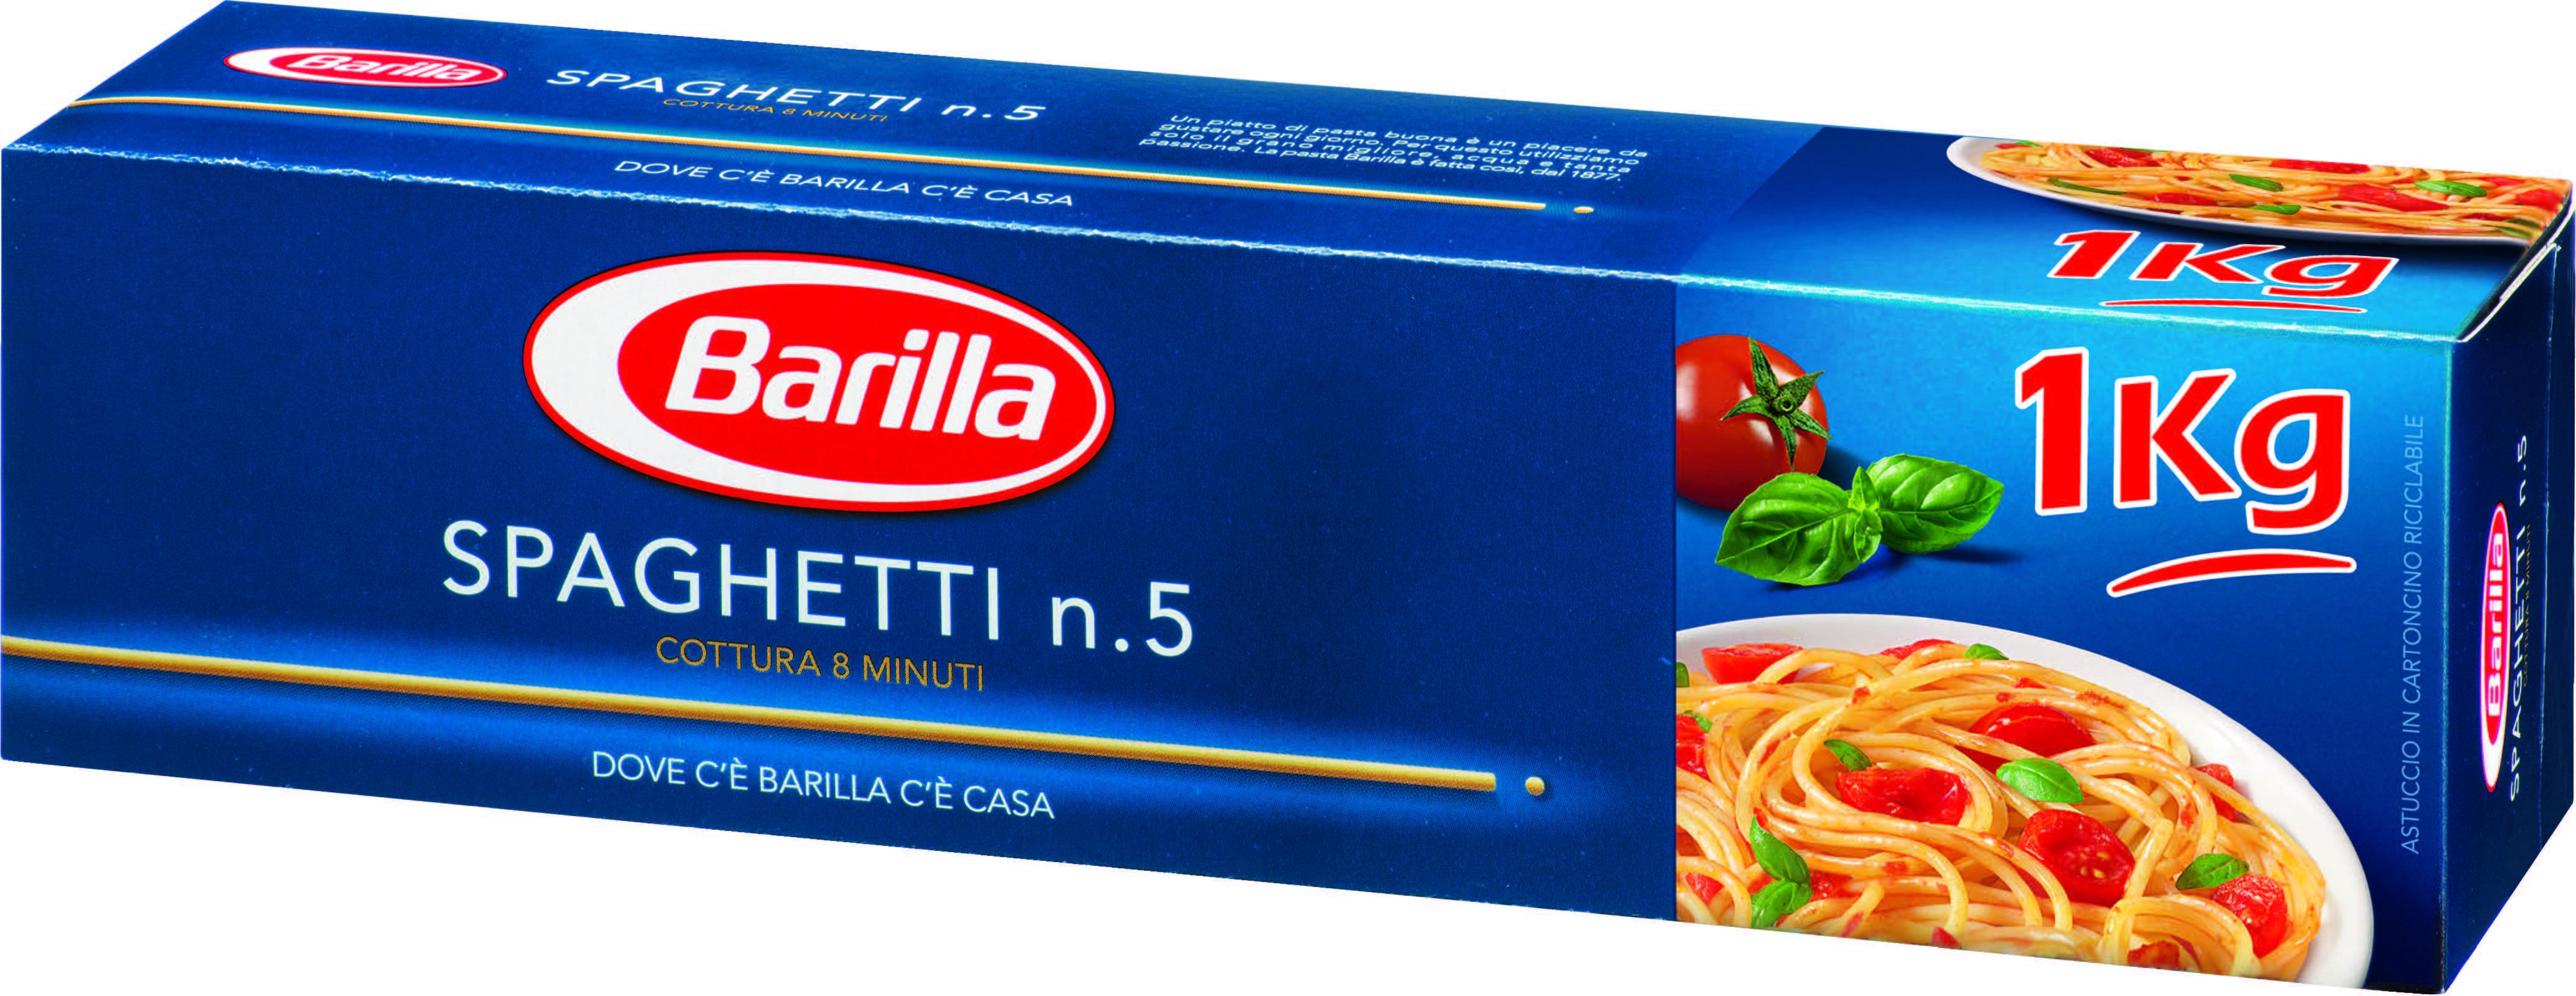 Spaghetti N°5 Barilla